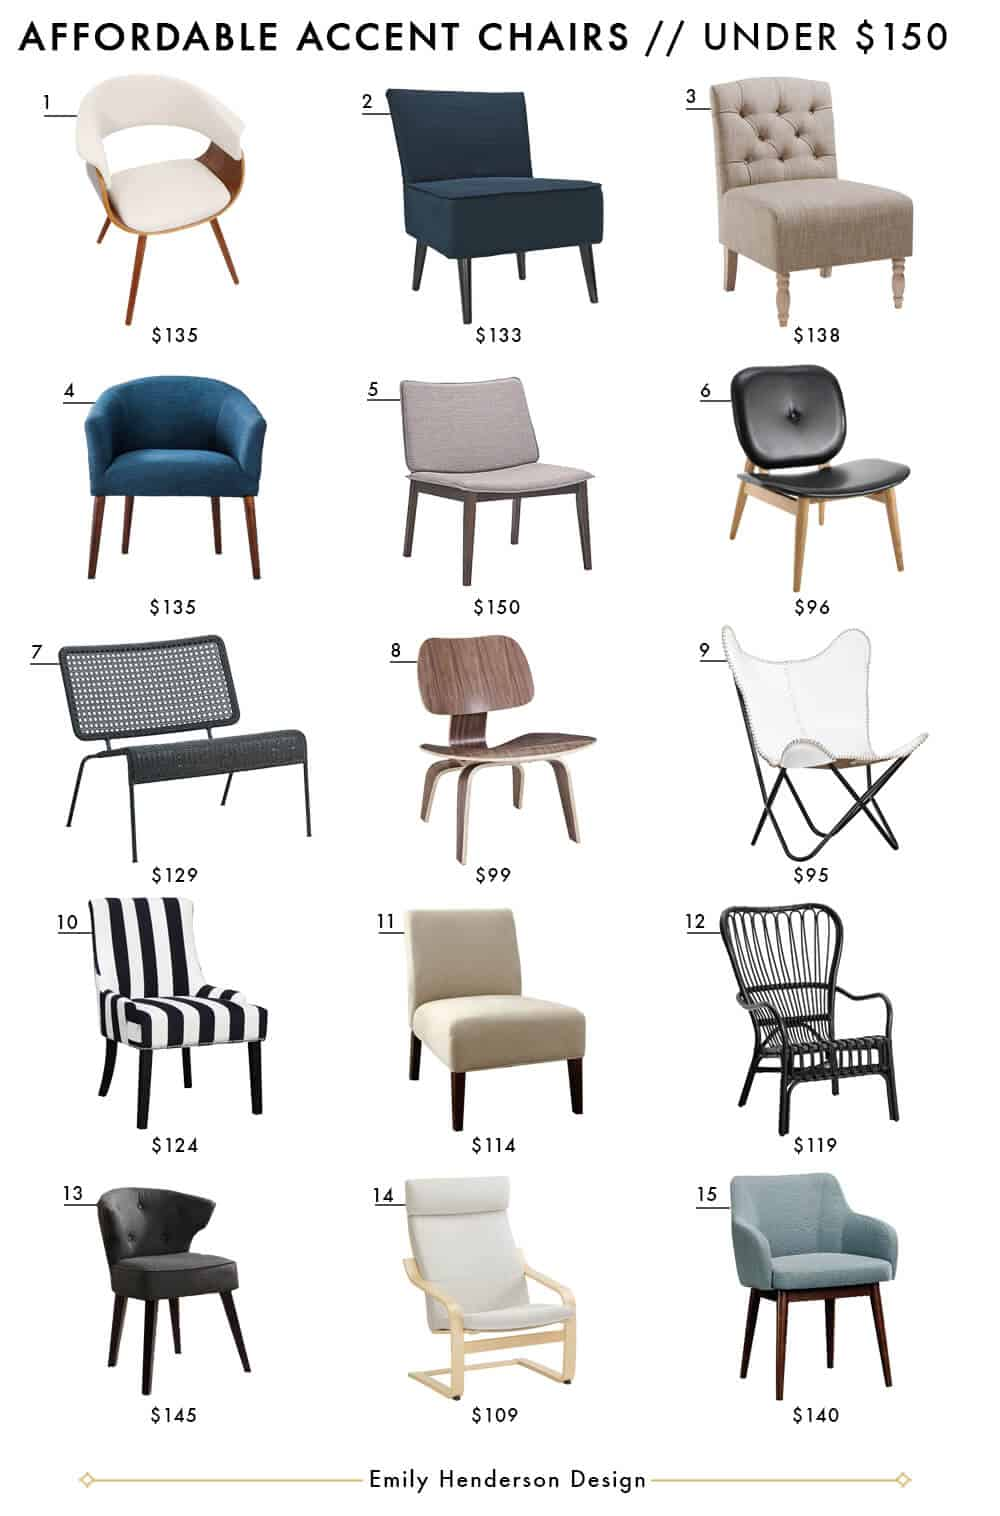 Remarkable Affordable Accent Chair Roundup Emily Henderson Bloglovin Inzonedesignstudio Interior Chair Design Inzonedesignstudiocom